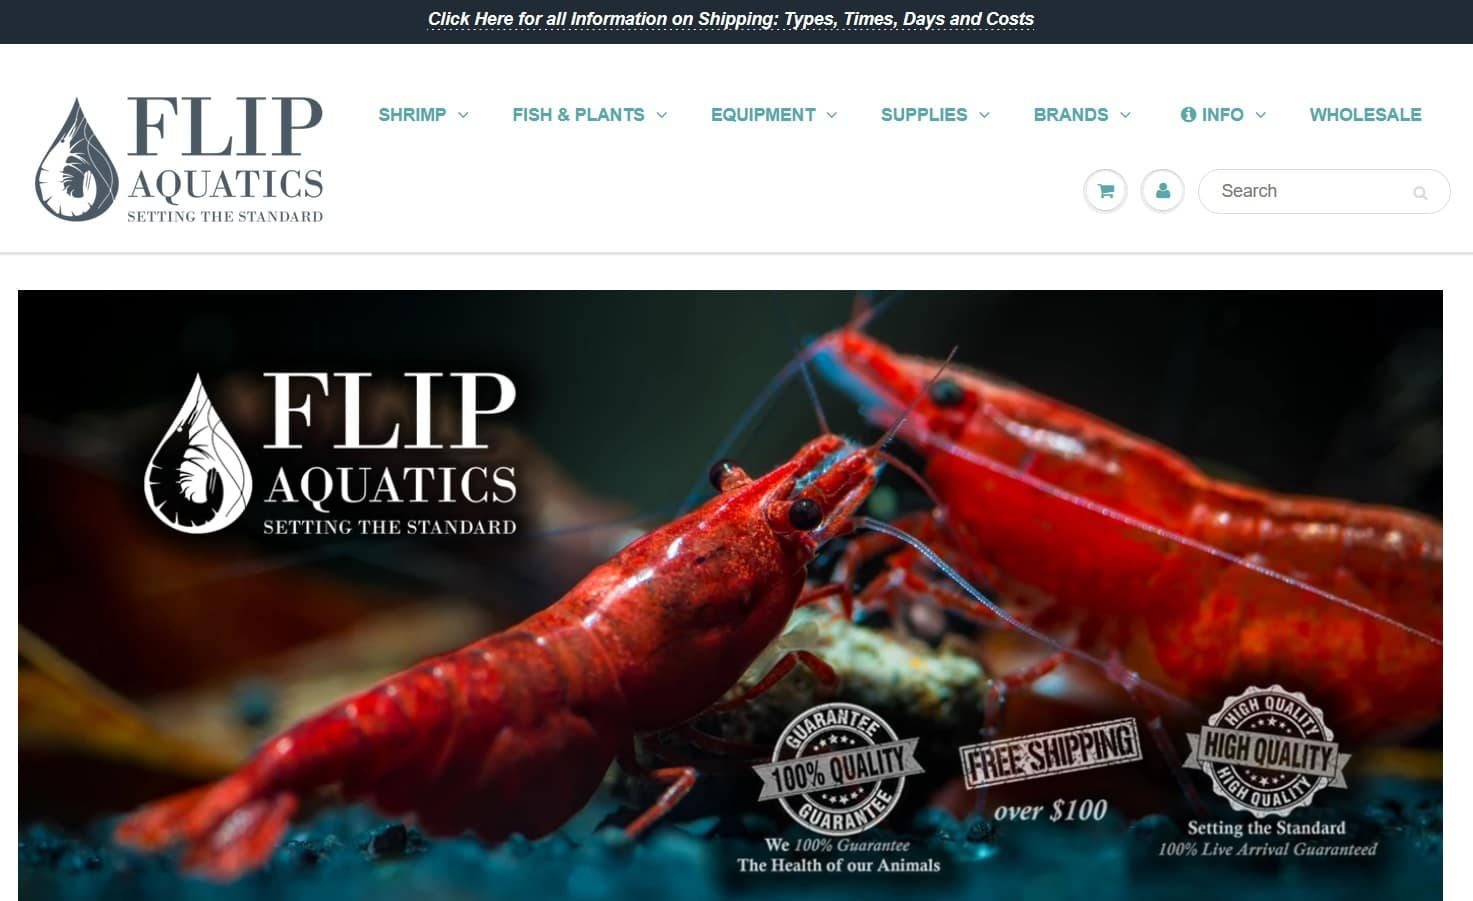 flipaquatics website homepage